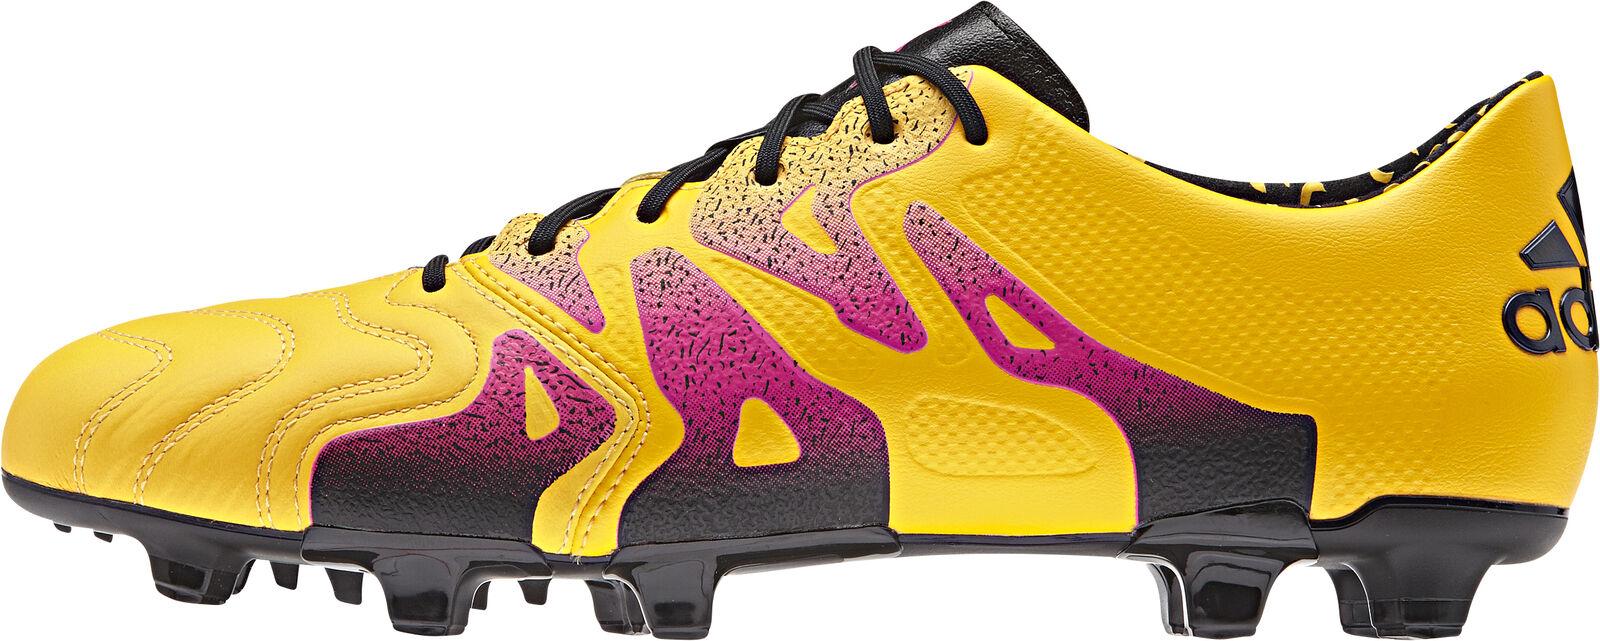 Adidas X 15.1 Firm Ground   AG Leather Mens Football botas - oro